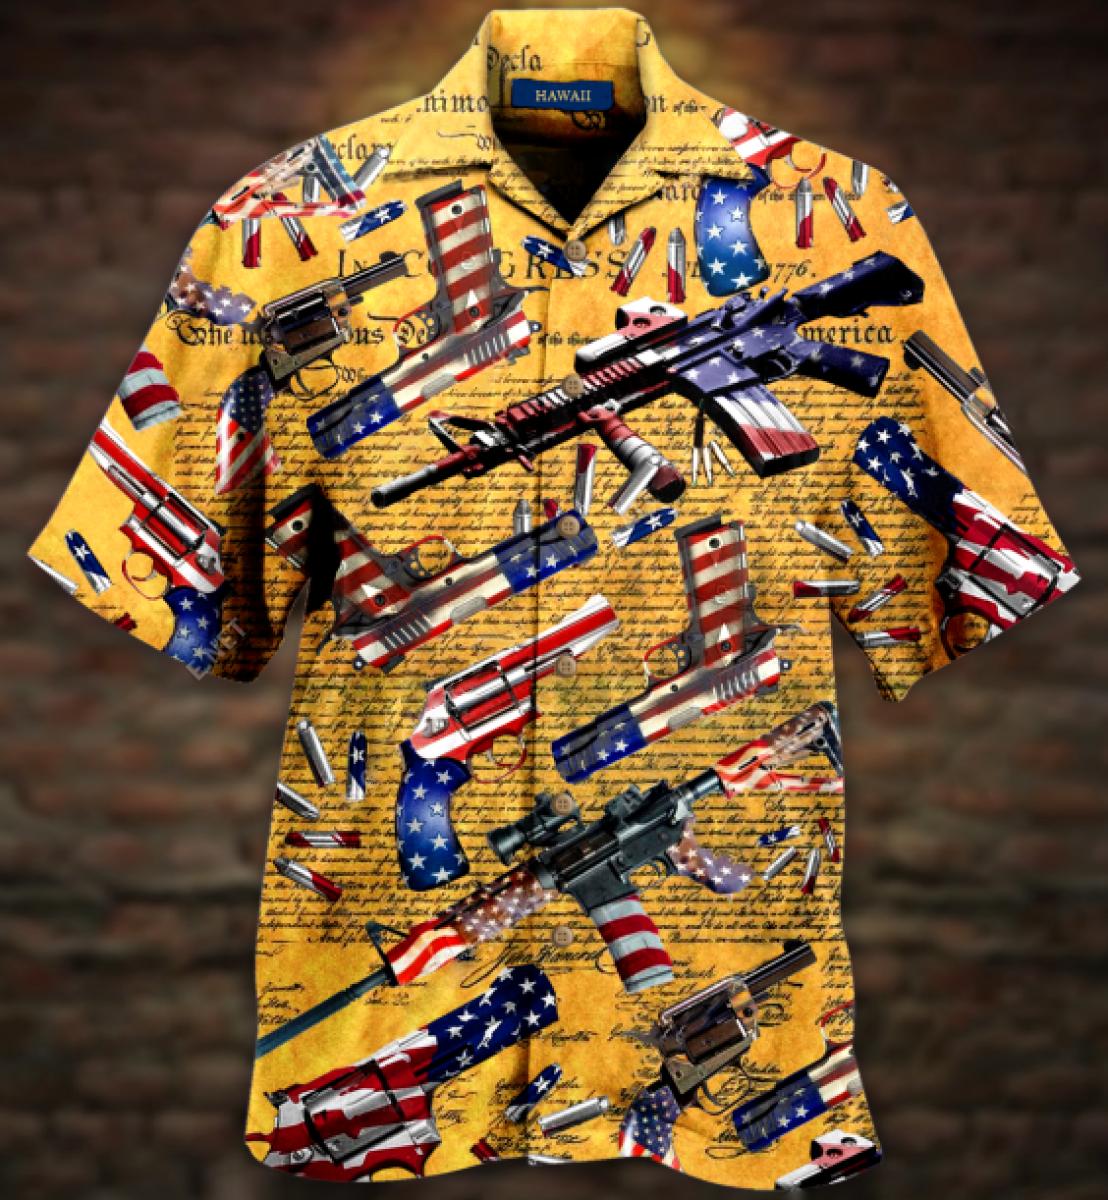 Gun Self Defense Is Our Unisex Hawaiian Shirt1